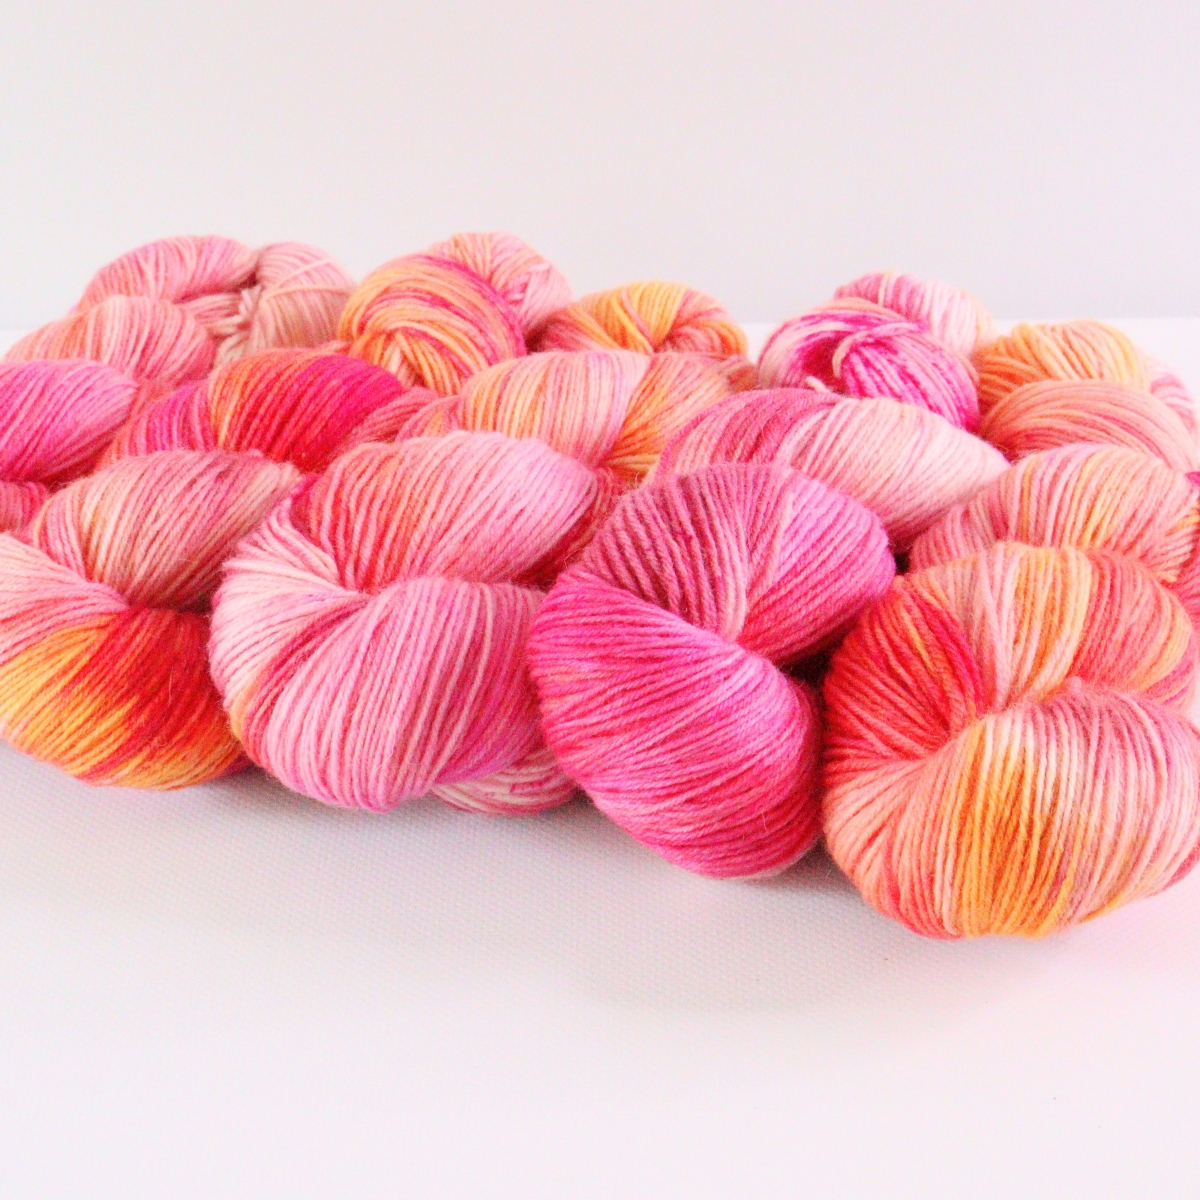 woodico.pro hand dyed yarn 076 5 1200x1200 - Hand dyed yarn / 076